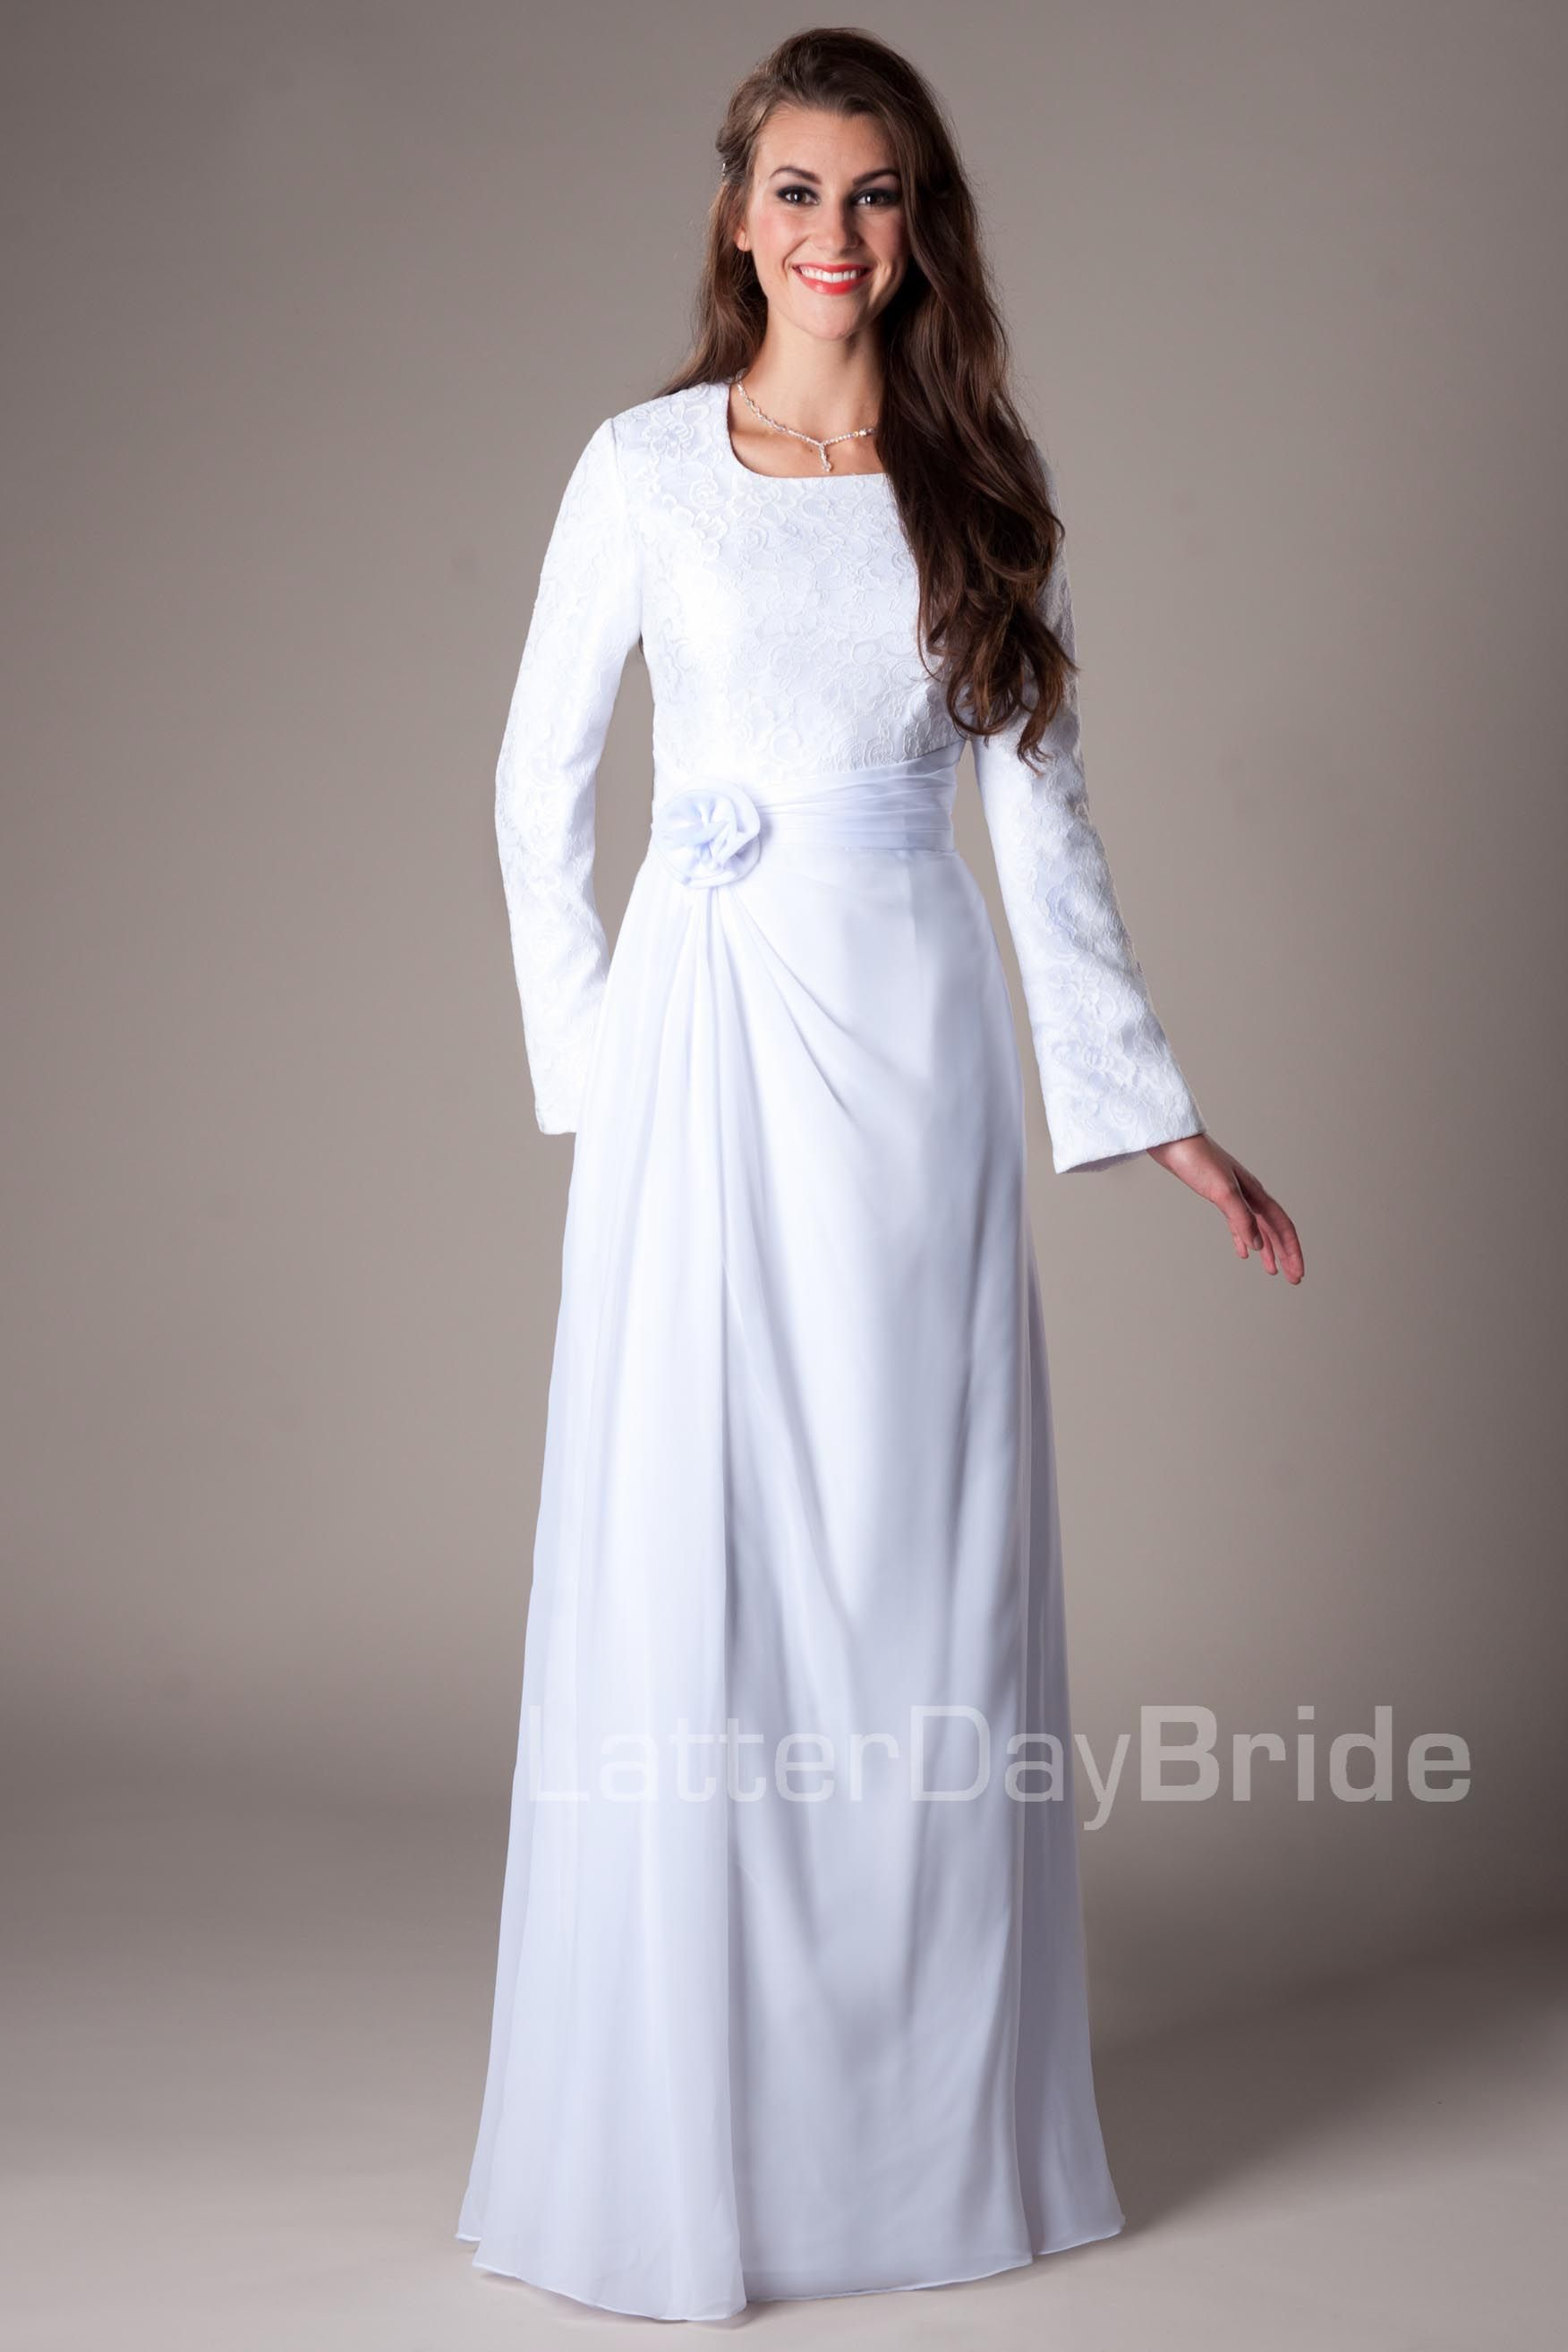 240.00 Temple Dresses : Bostonhttp://www.latterdaybride.com/temple ...